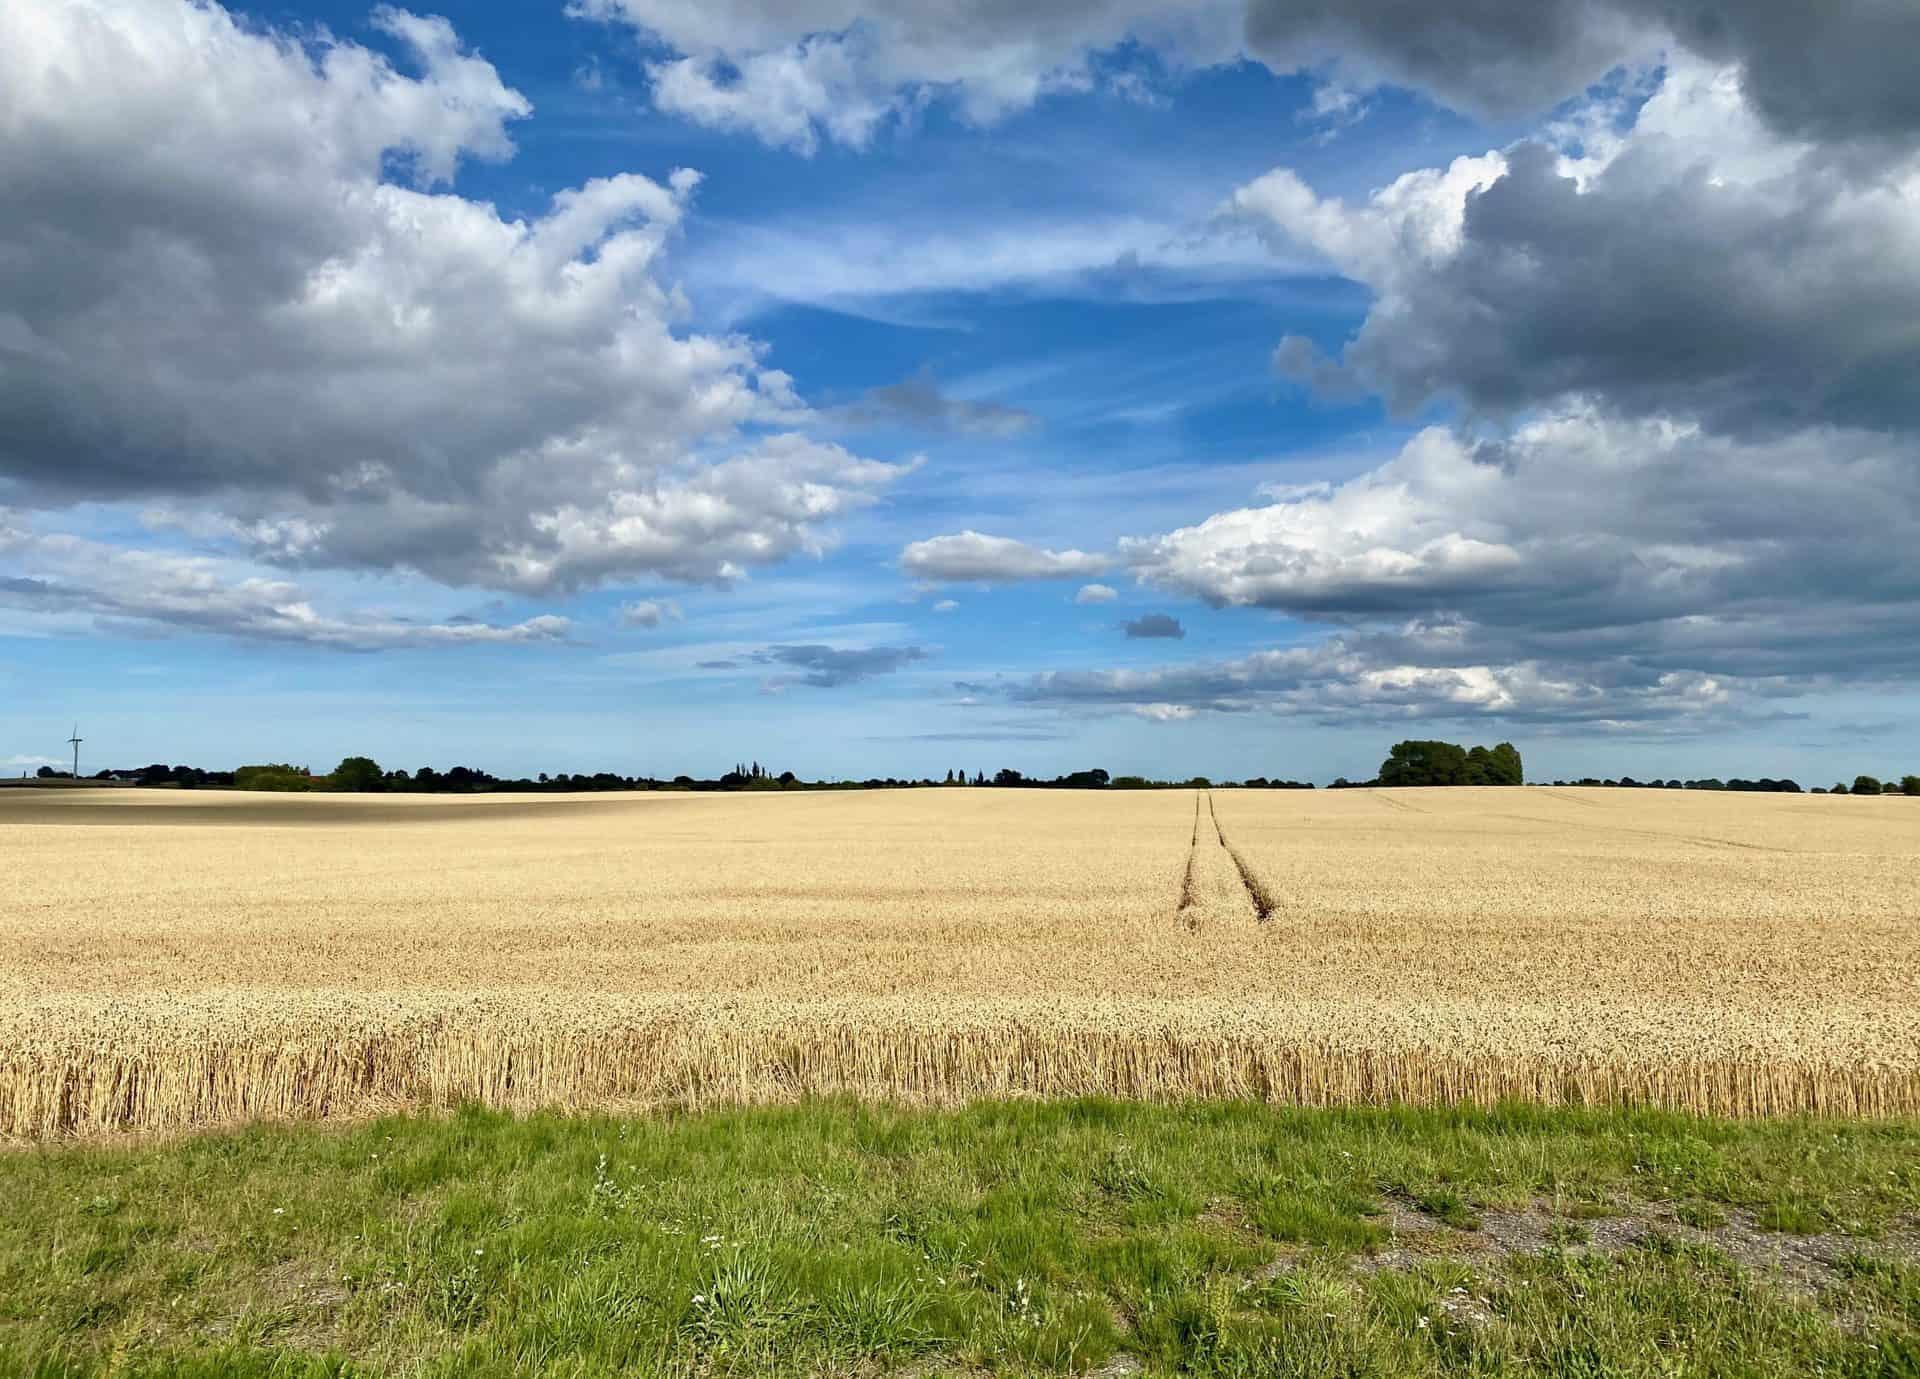 Reise-Wohnmobil-Daenemark-Lolland-Weizenfelder-Kornfelder